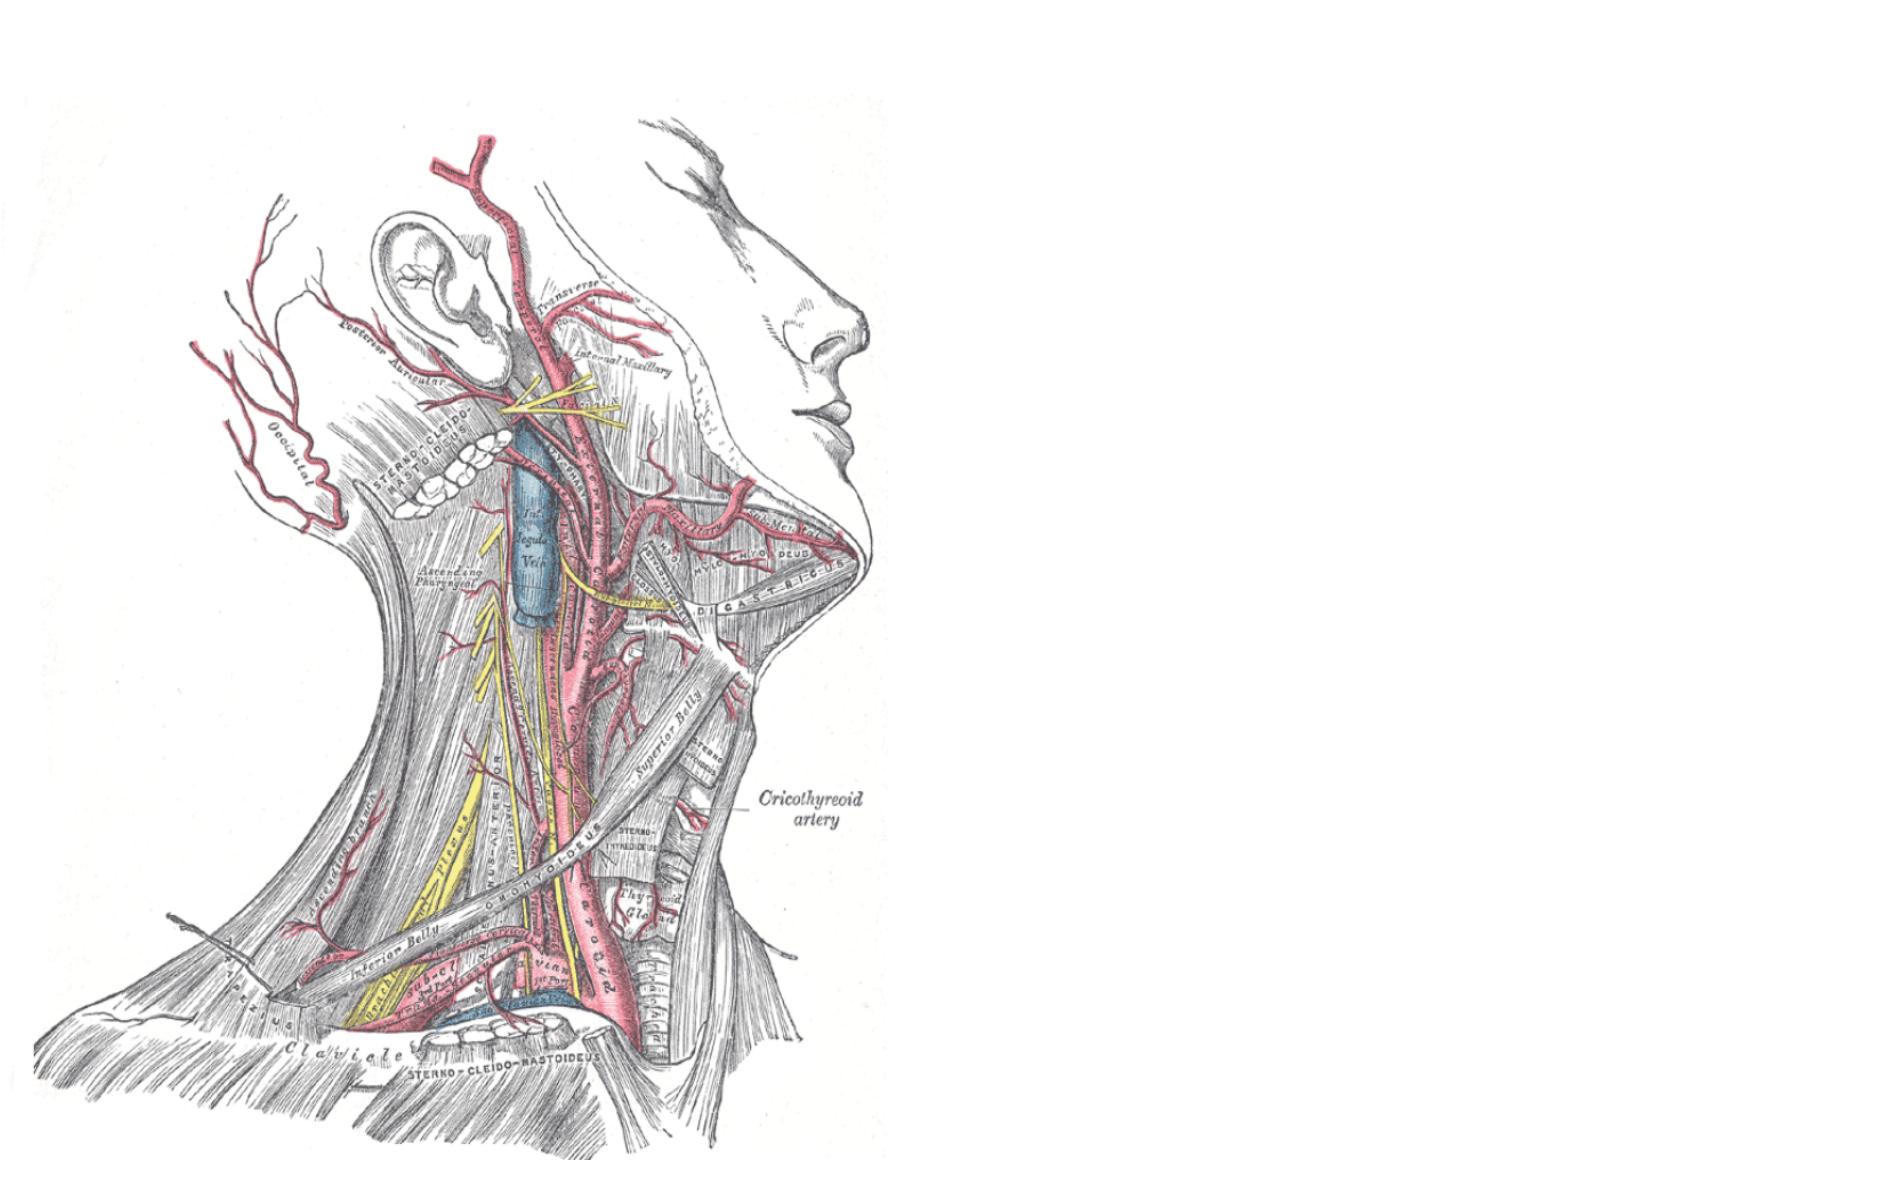 anatomy wallpaper background - photo #15